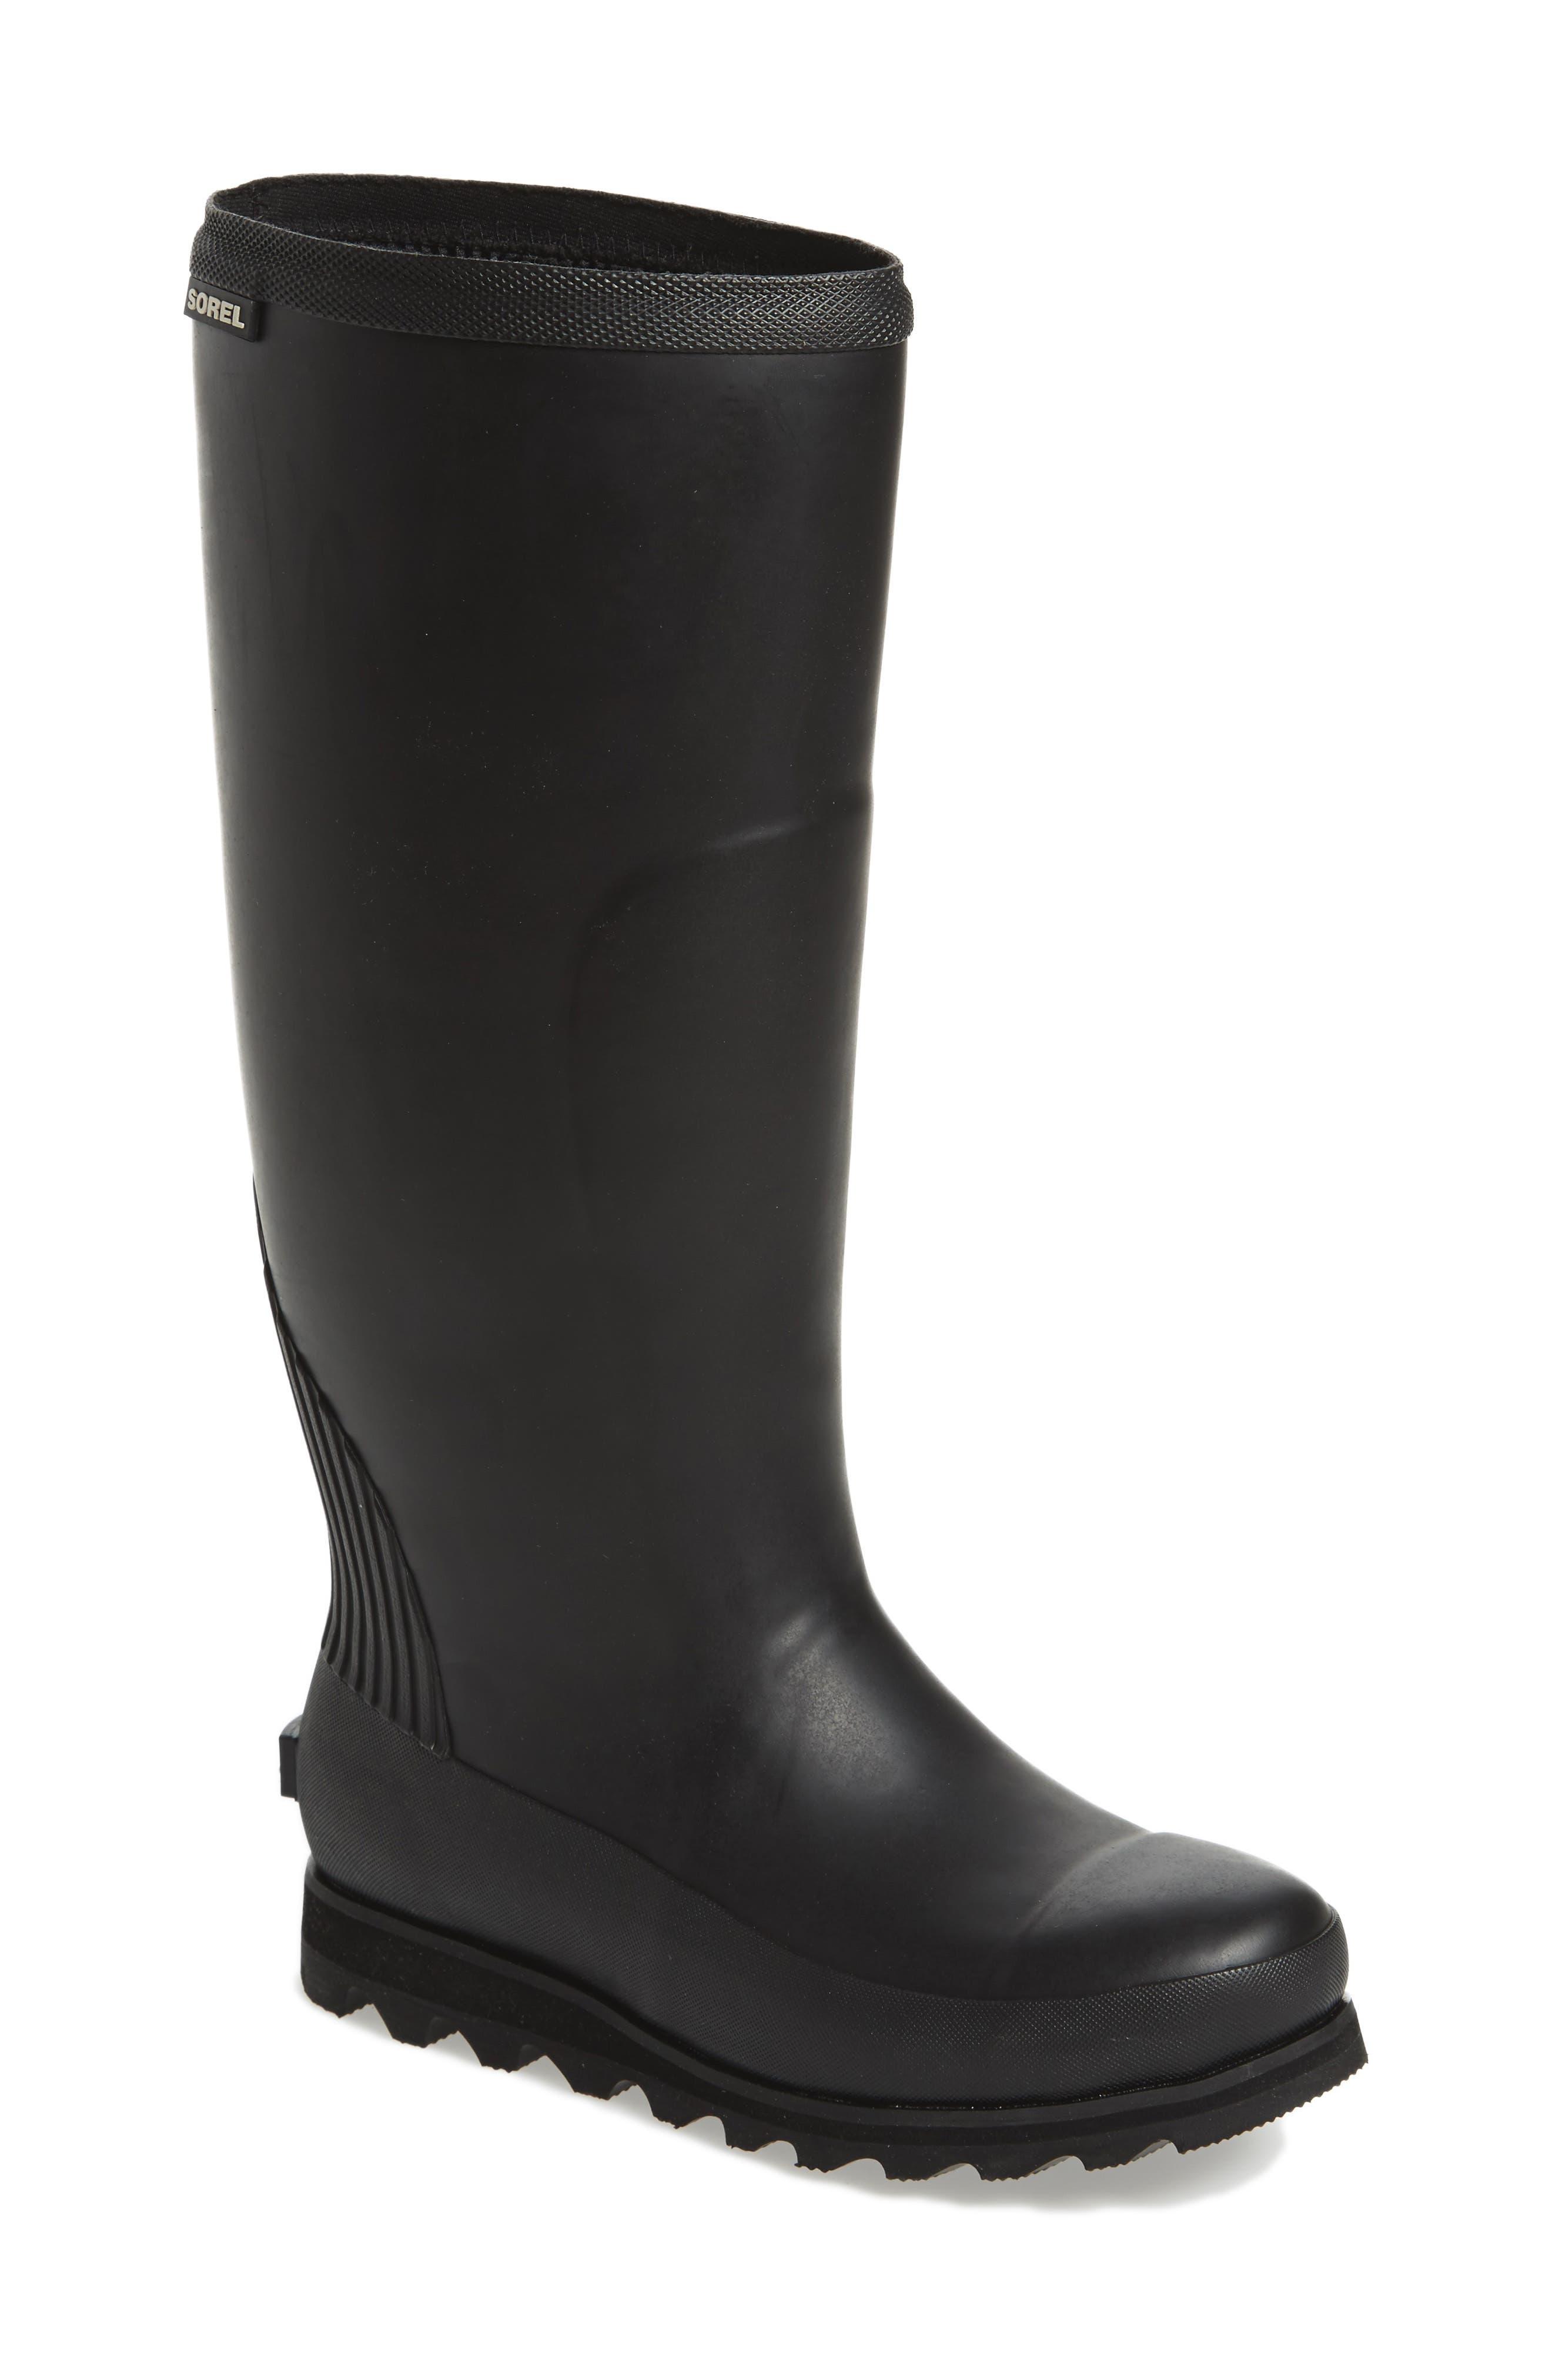 Main Image - SOREL Joan Tall Rain Boot (Women)